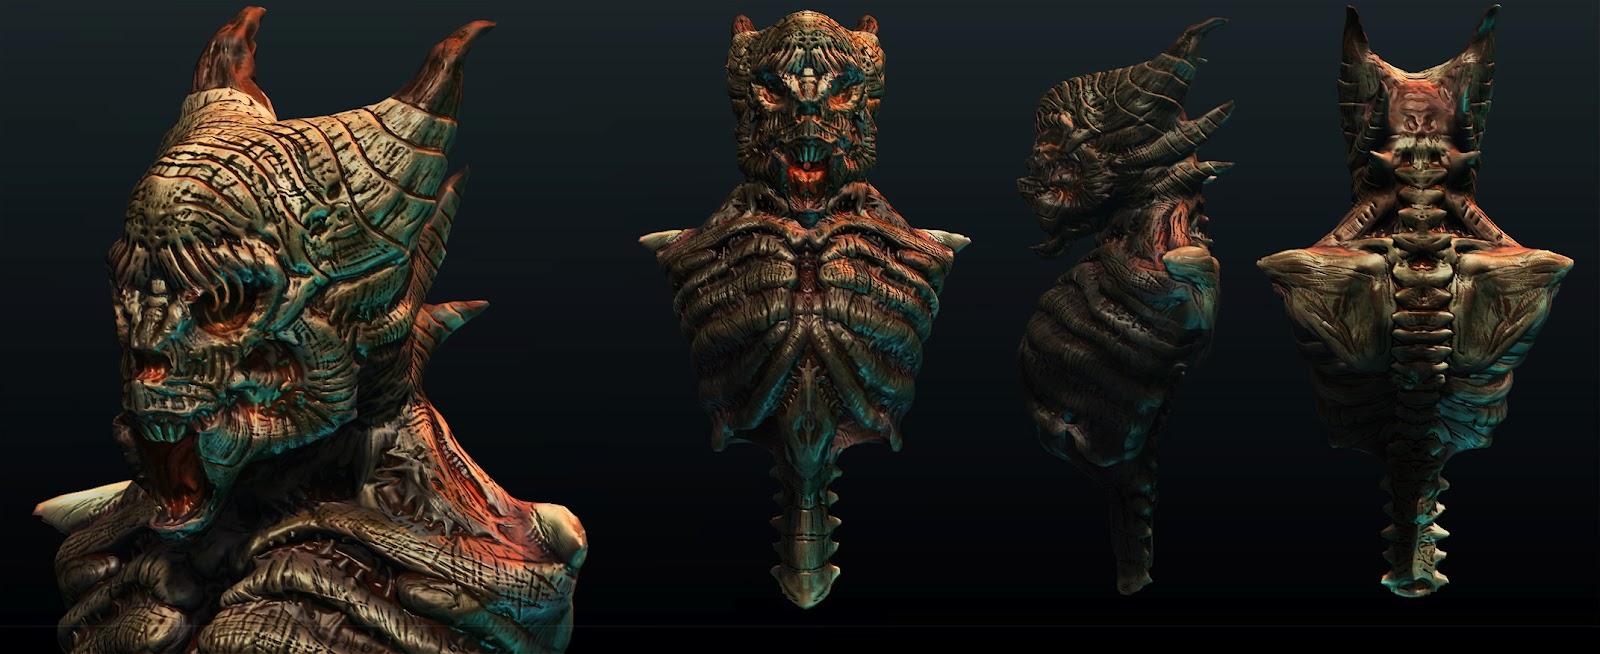 monster_renders_post_finished.jpg